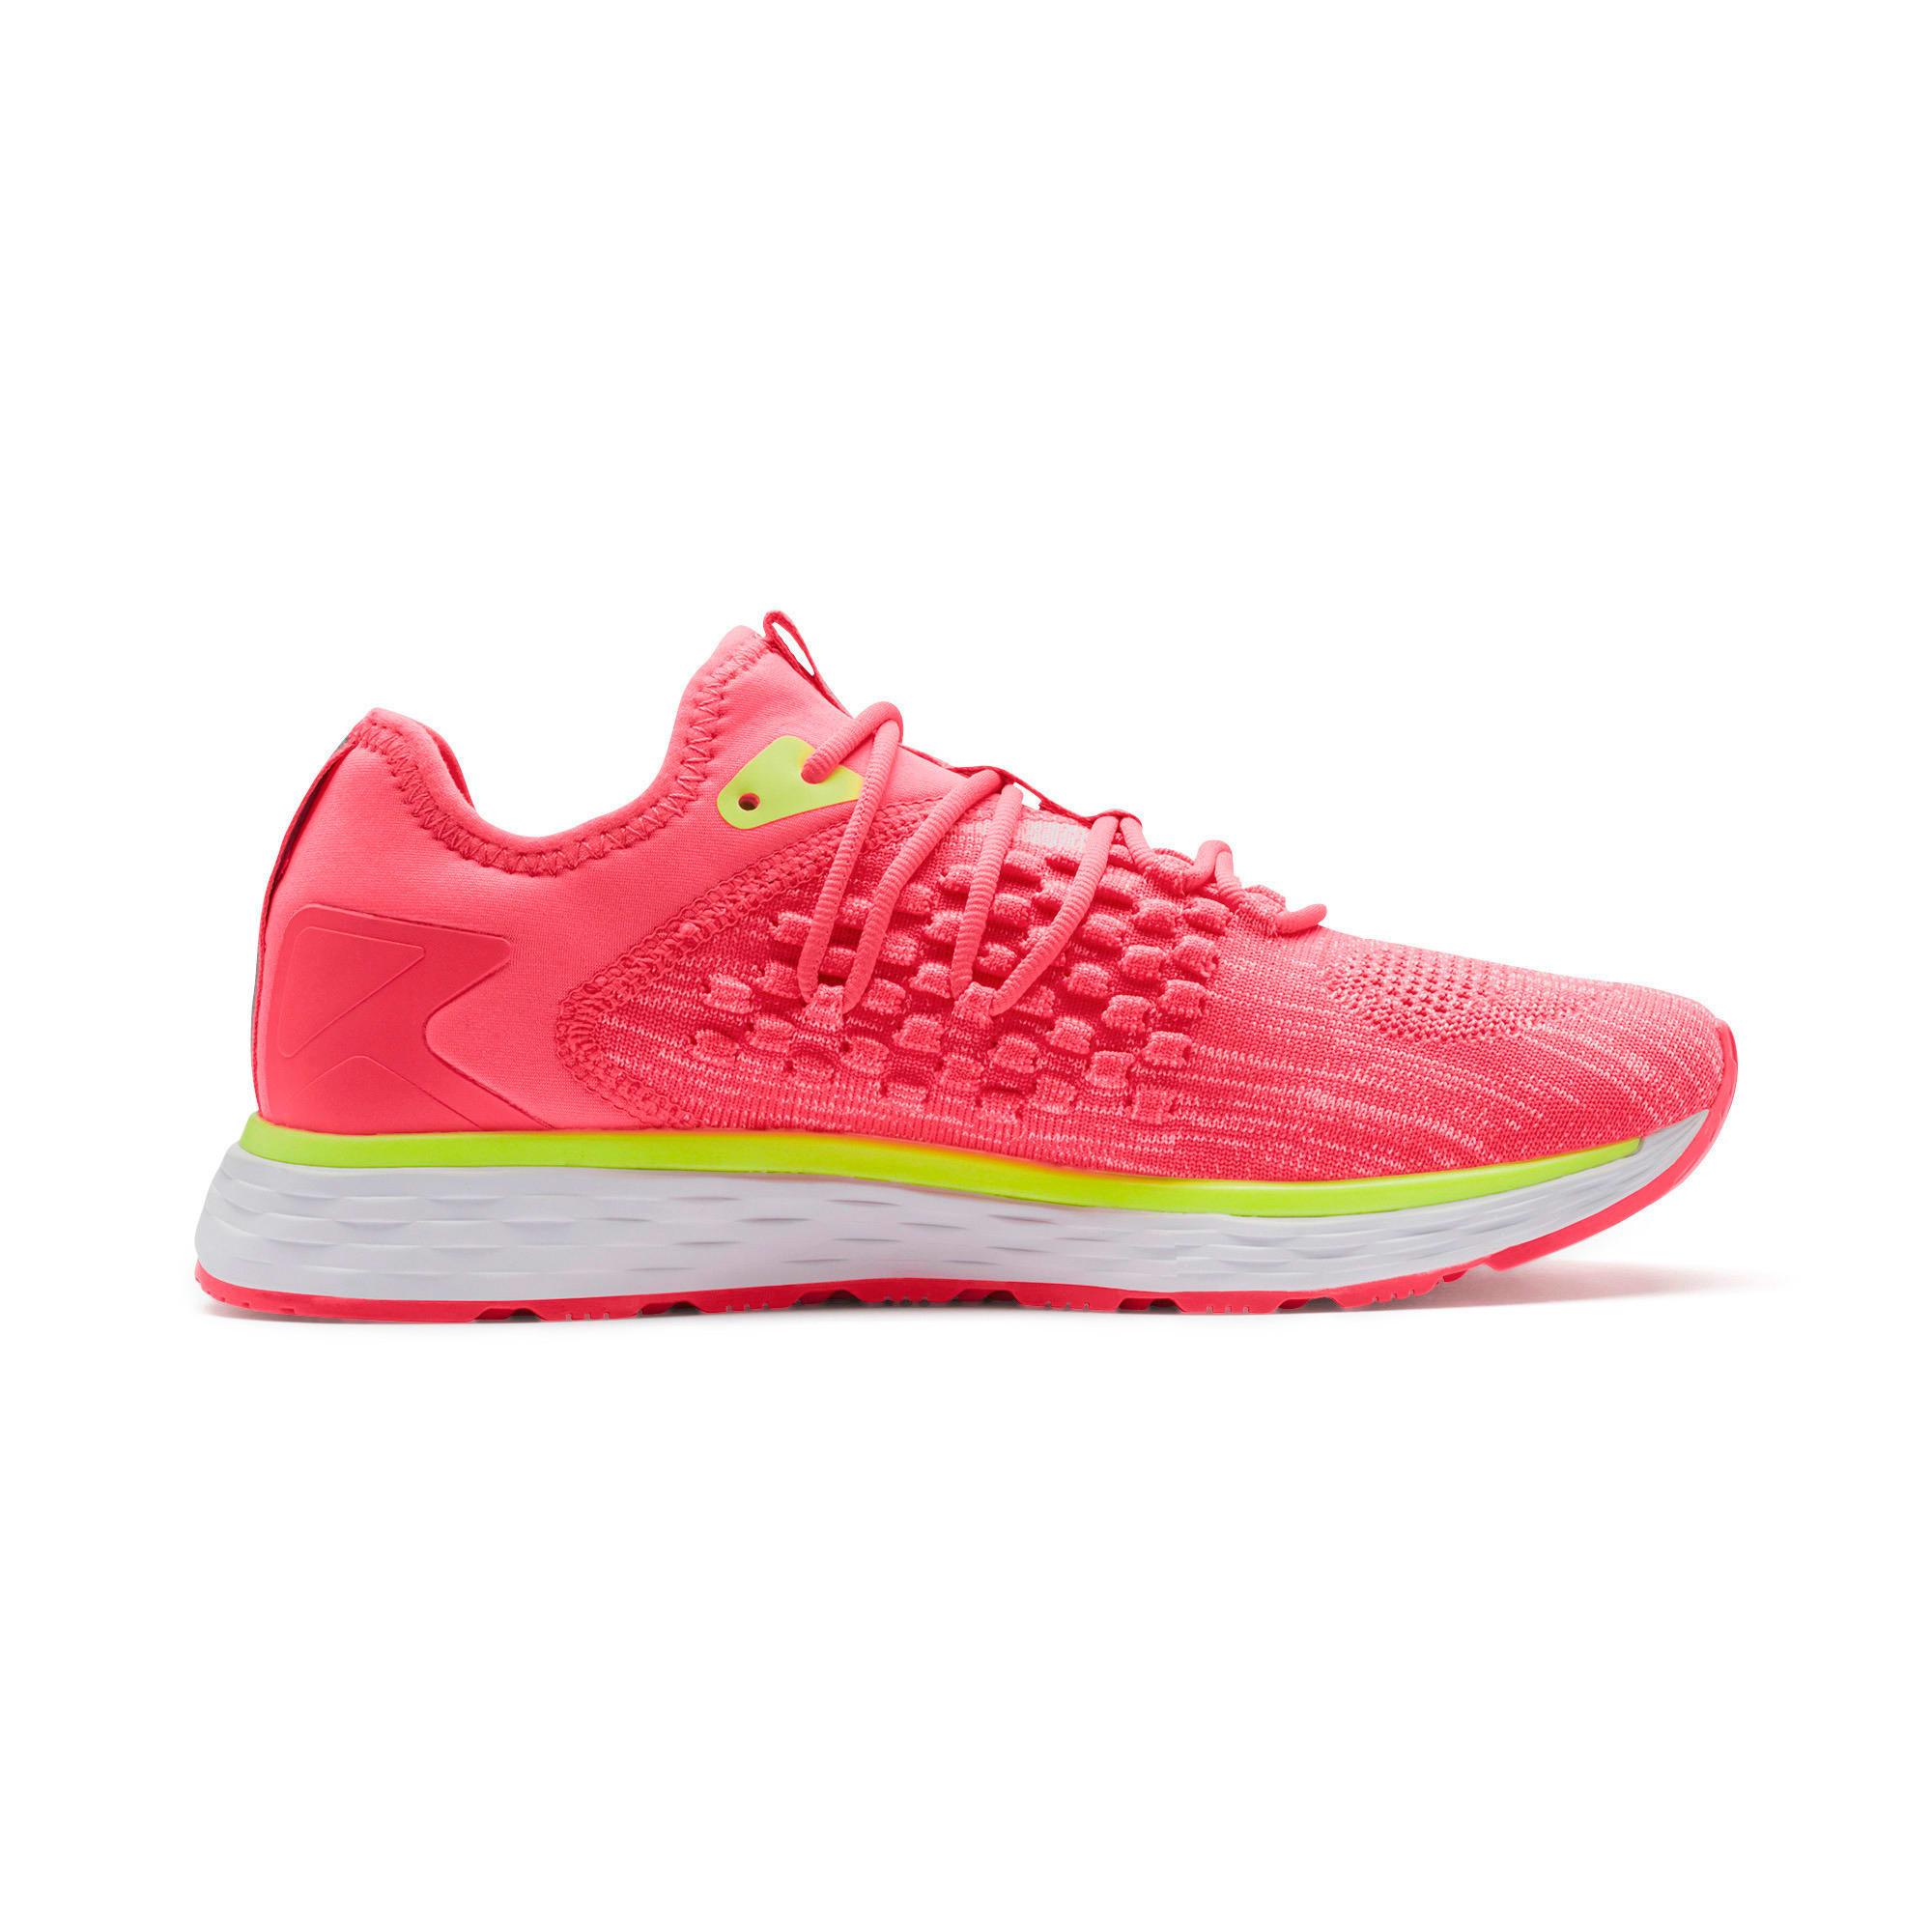 Thumbnail 6 of SPEED FUSEFIT Women's Running Shoes, Pink Alert-Puma White, medium